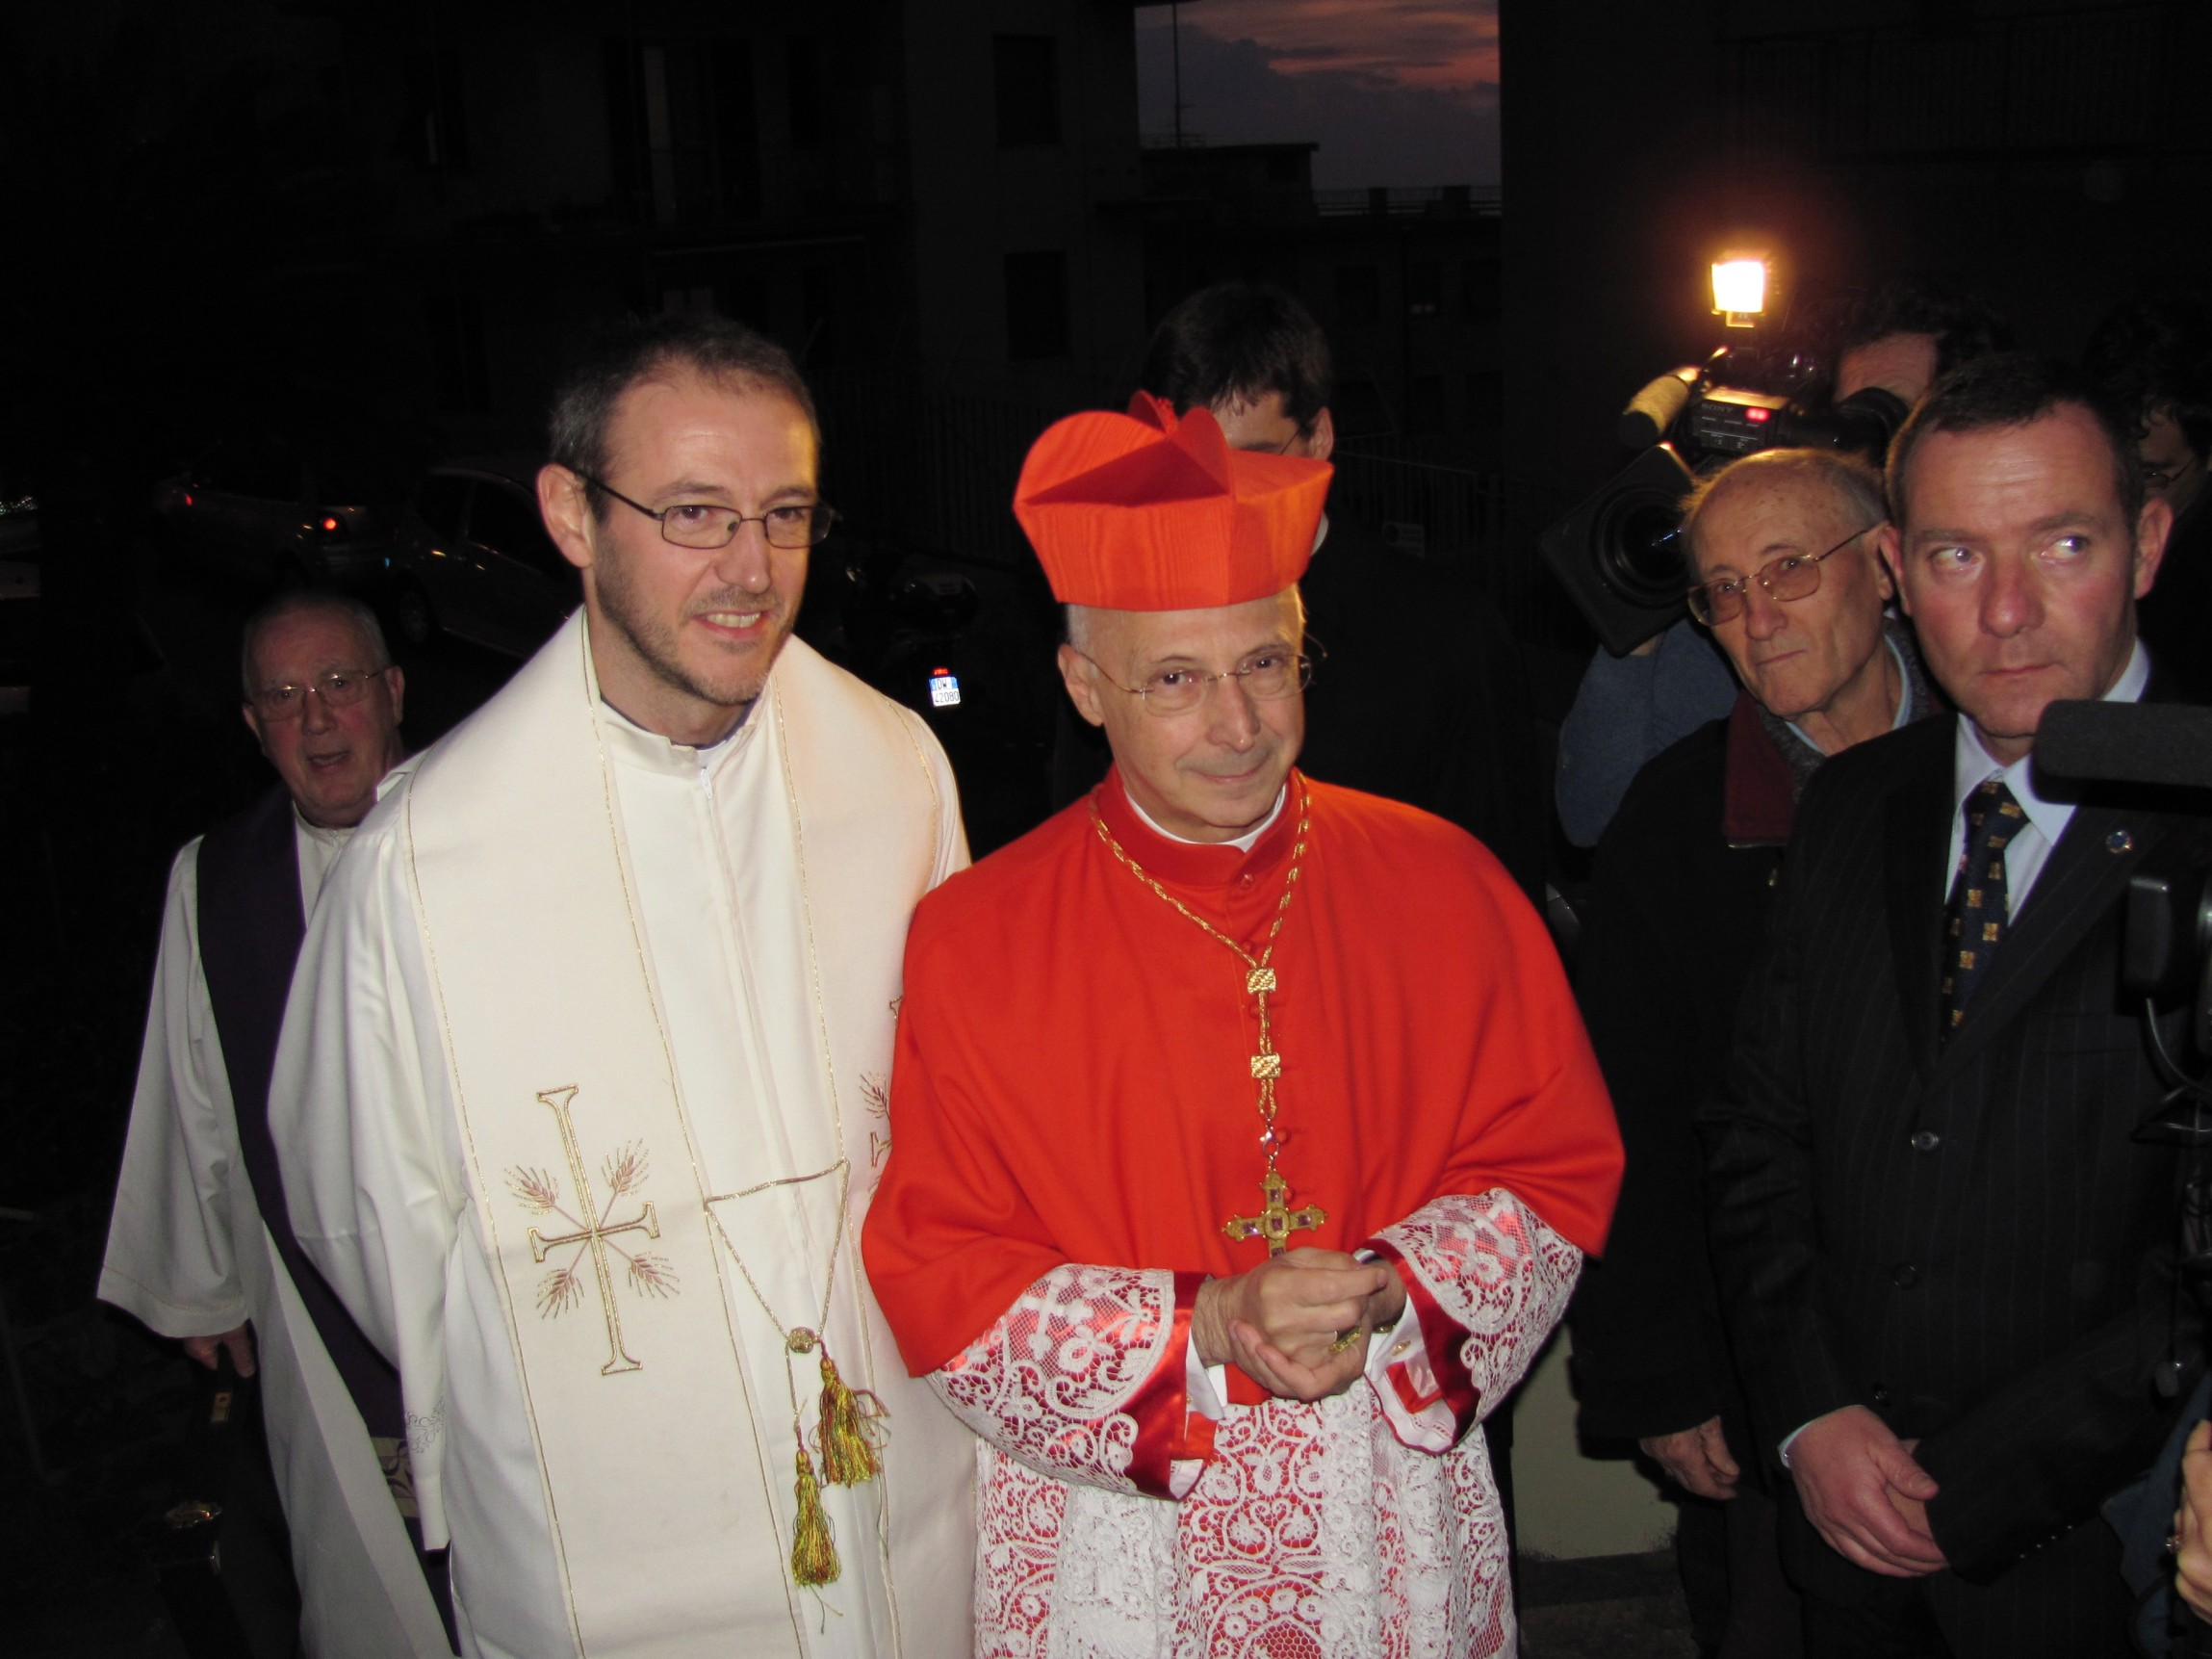 ingresso_giun_spirito_santo_2011-12-11-17-08-54